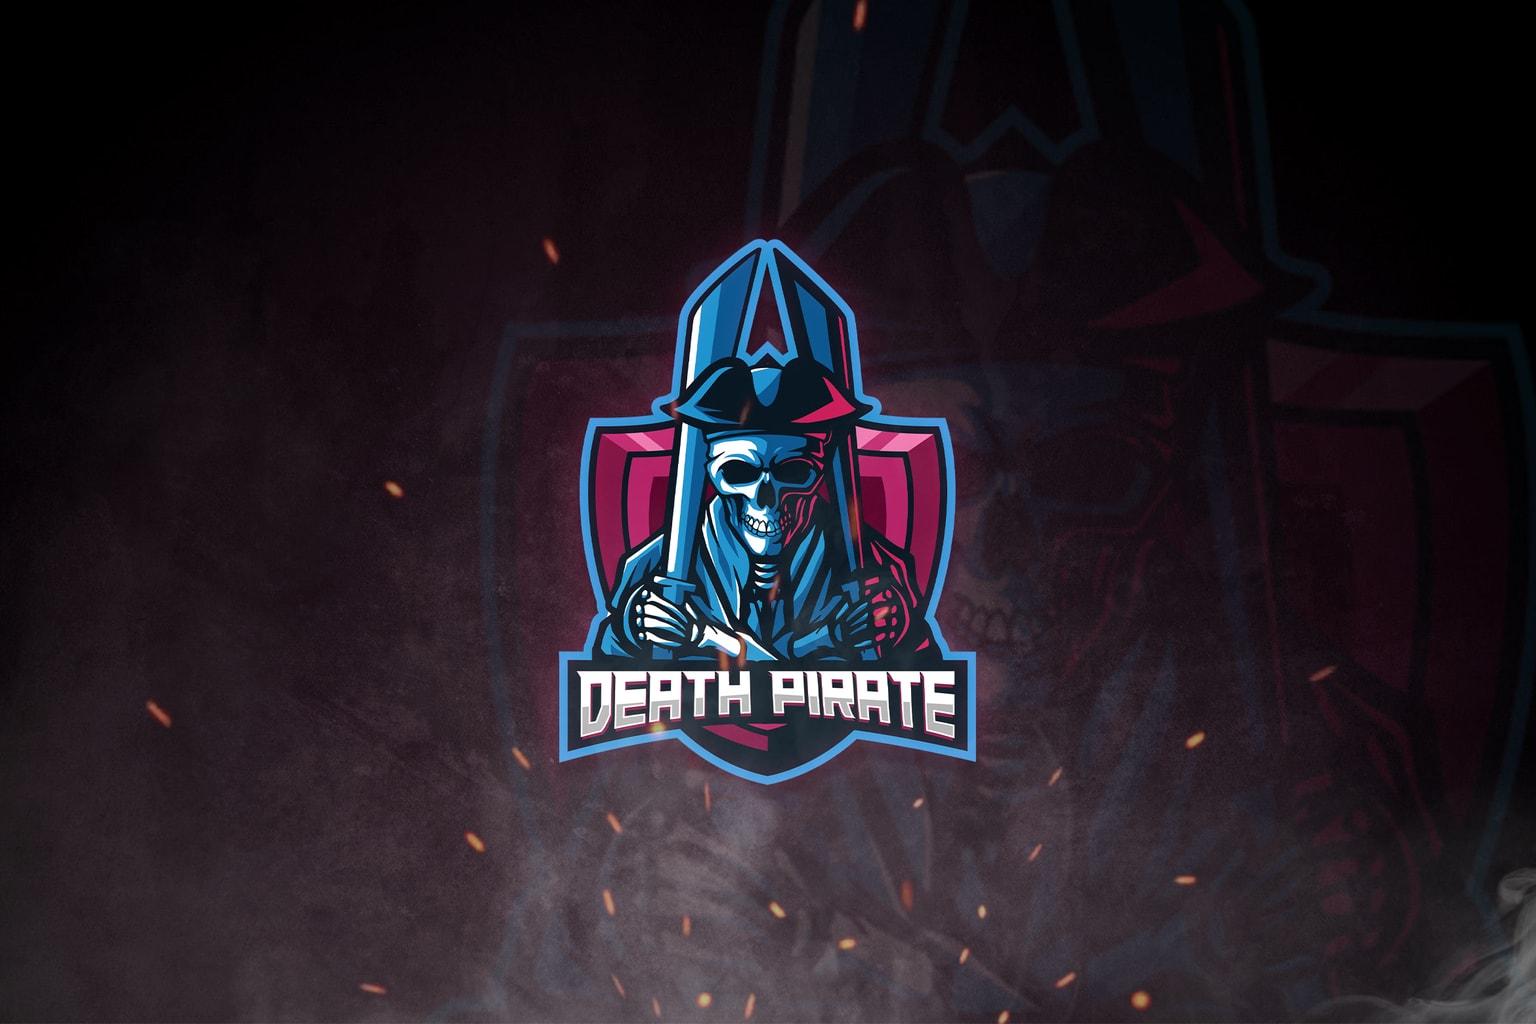 esport logo death pirate